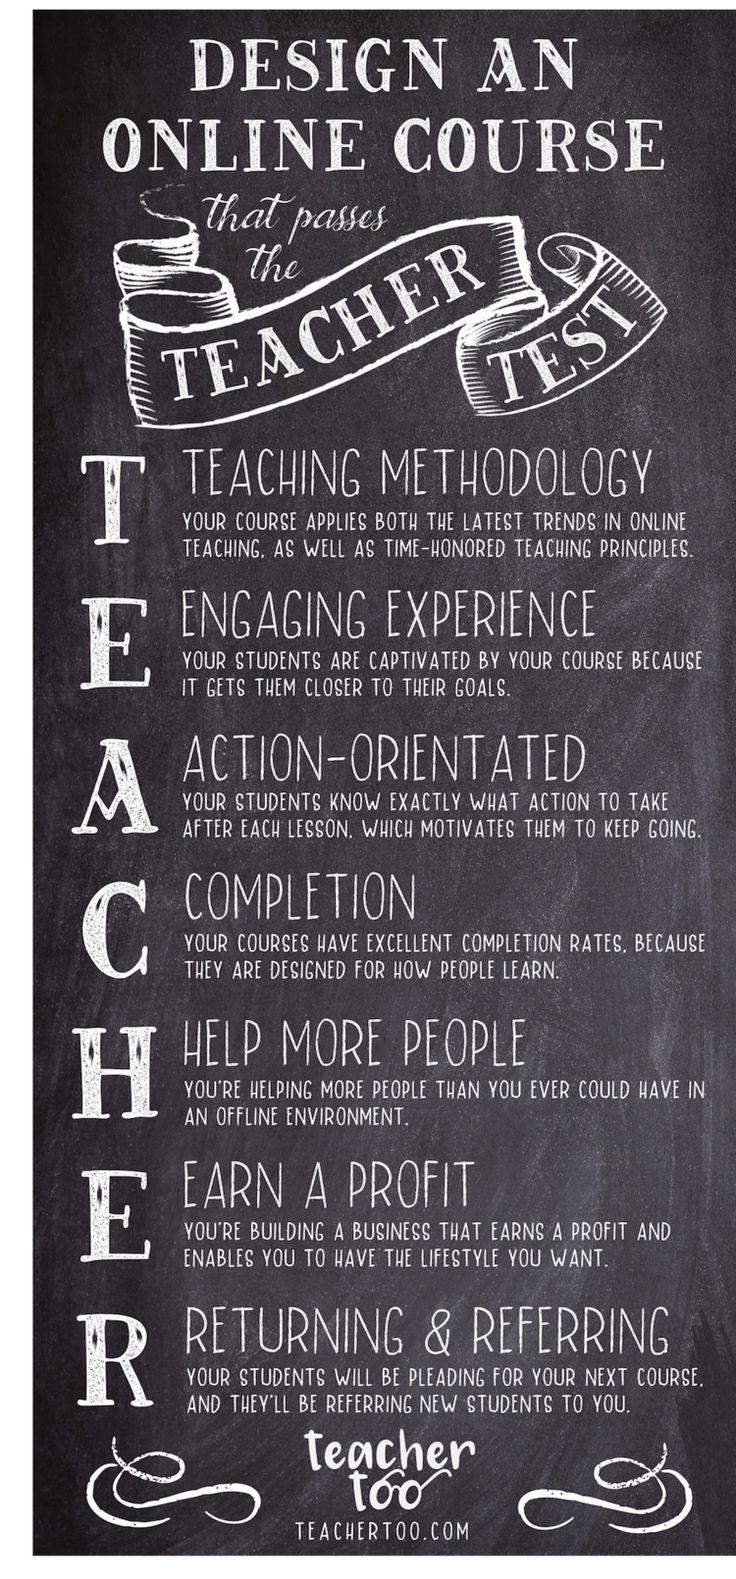 Online TEACHER Test Infographic | Online Teaching | Online course